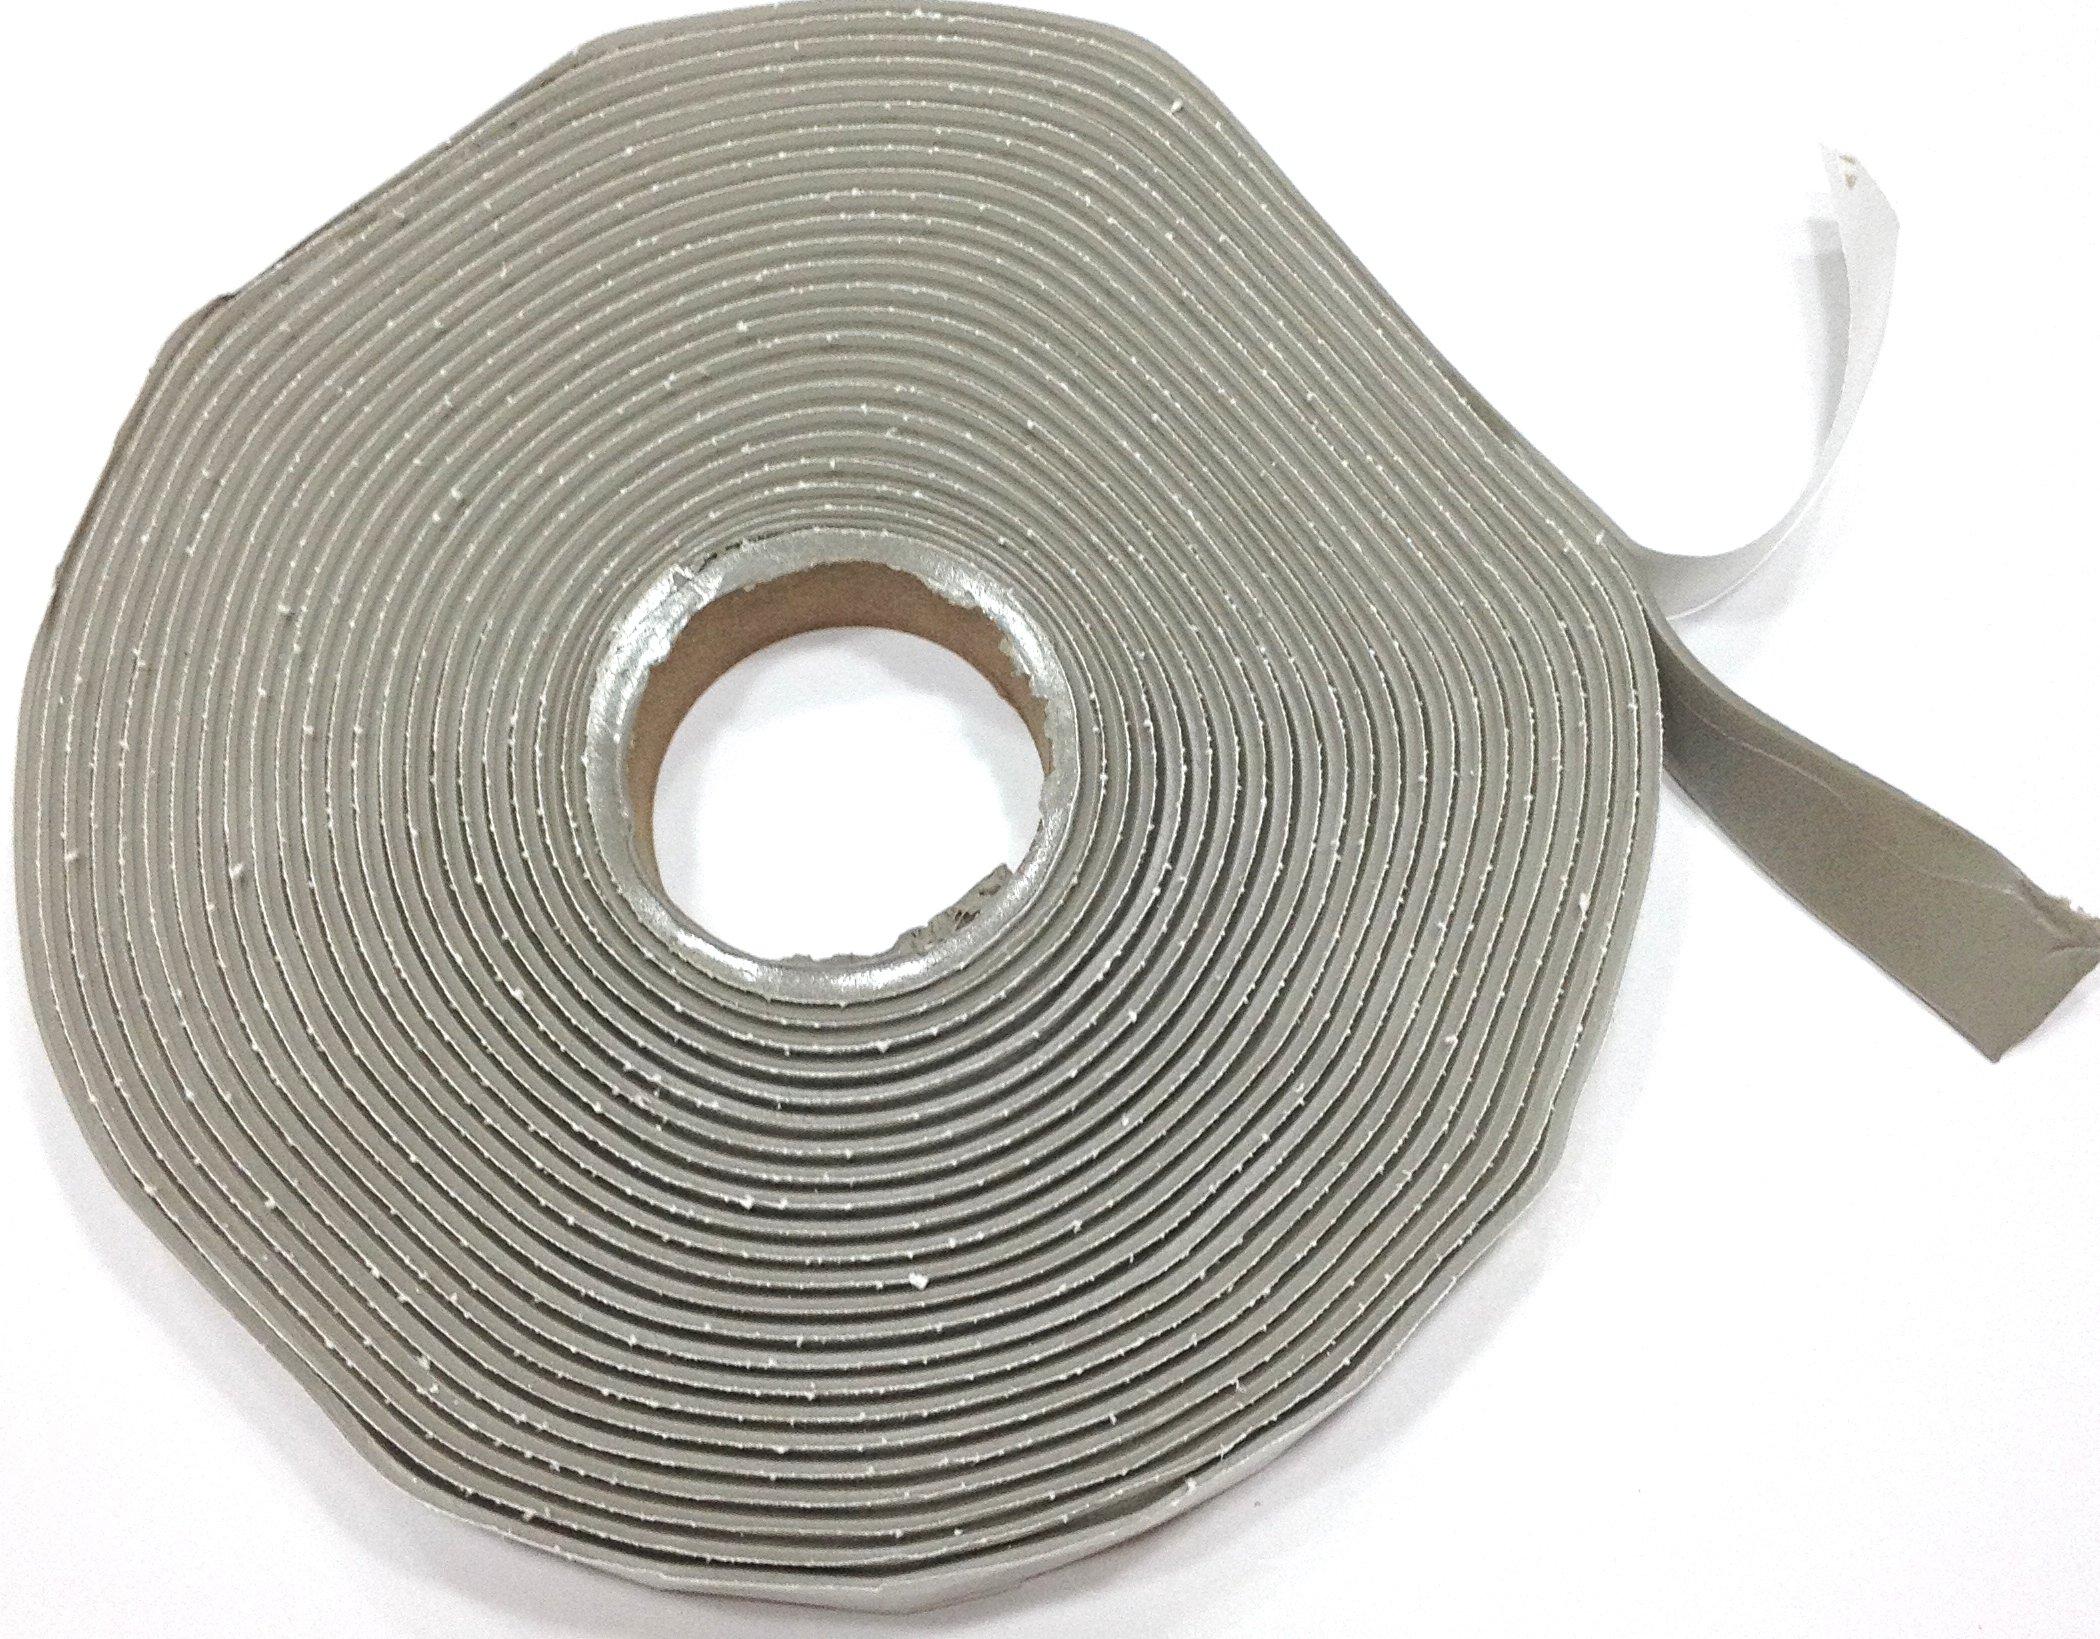 Colorimetrics Gray Putty Tape / Butyl Tape 1/8'' x 3/4'' x 30' (Single Roll)